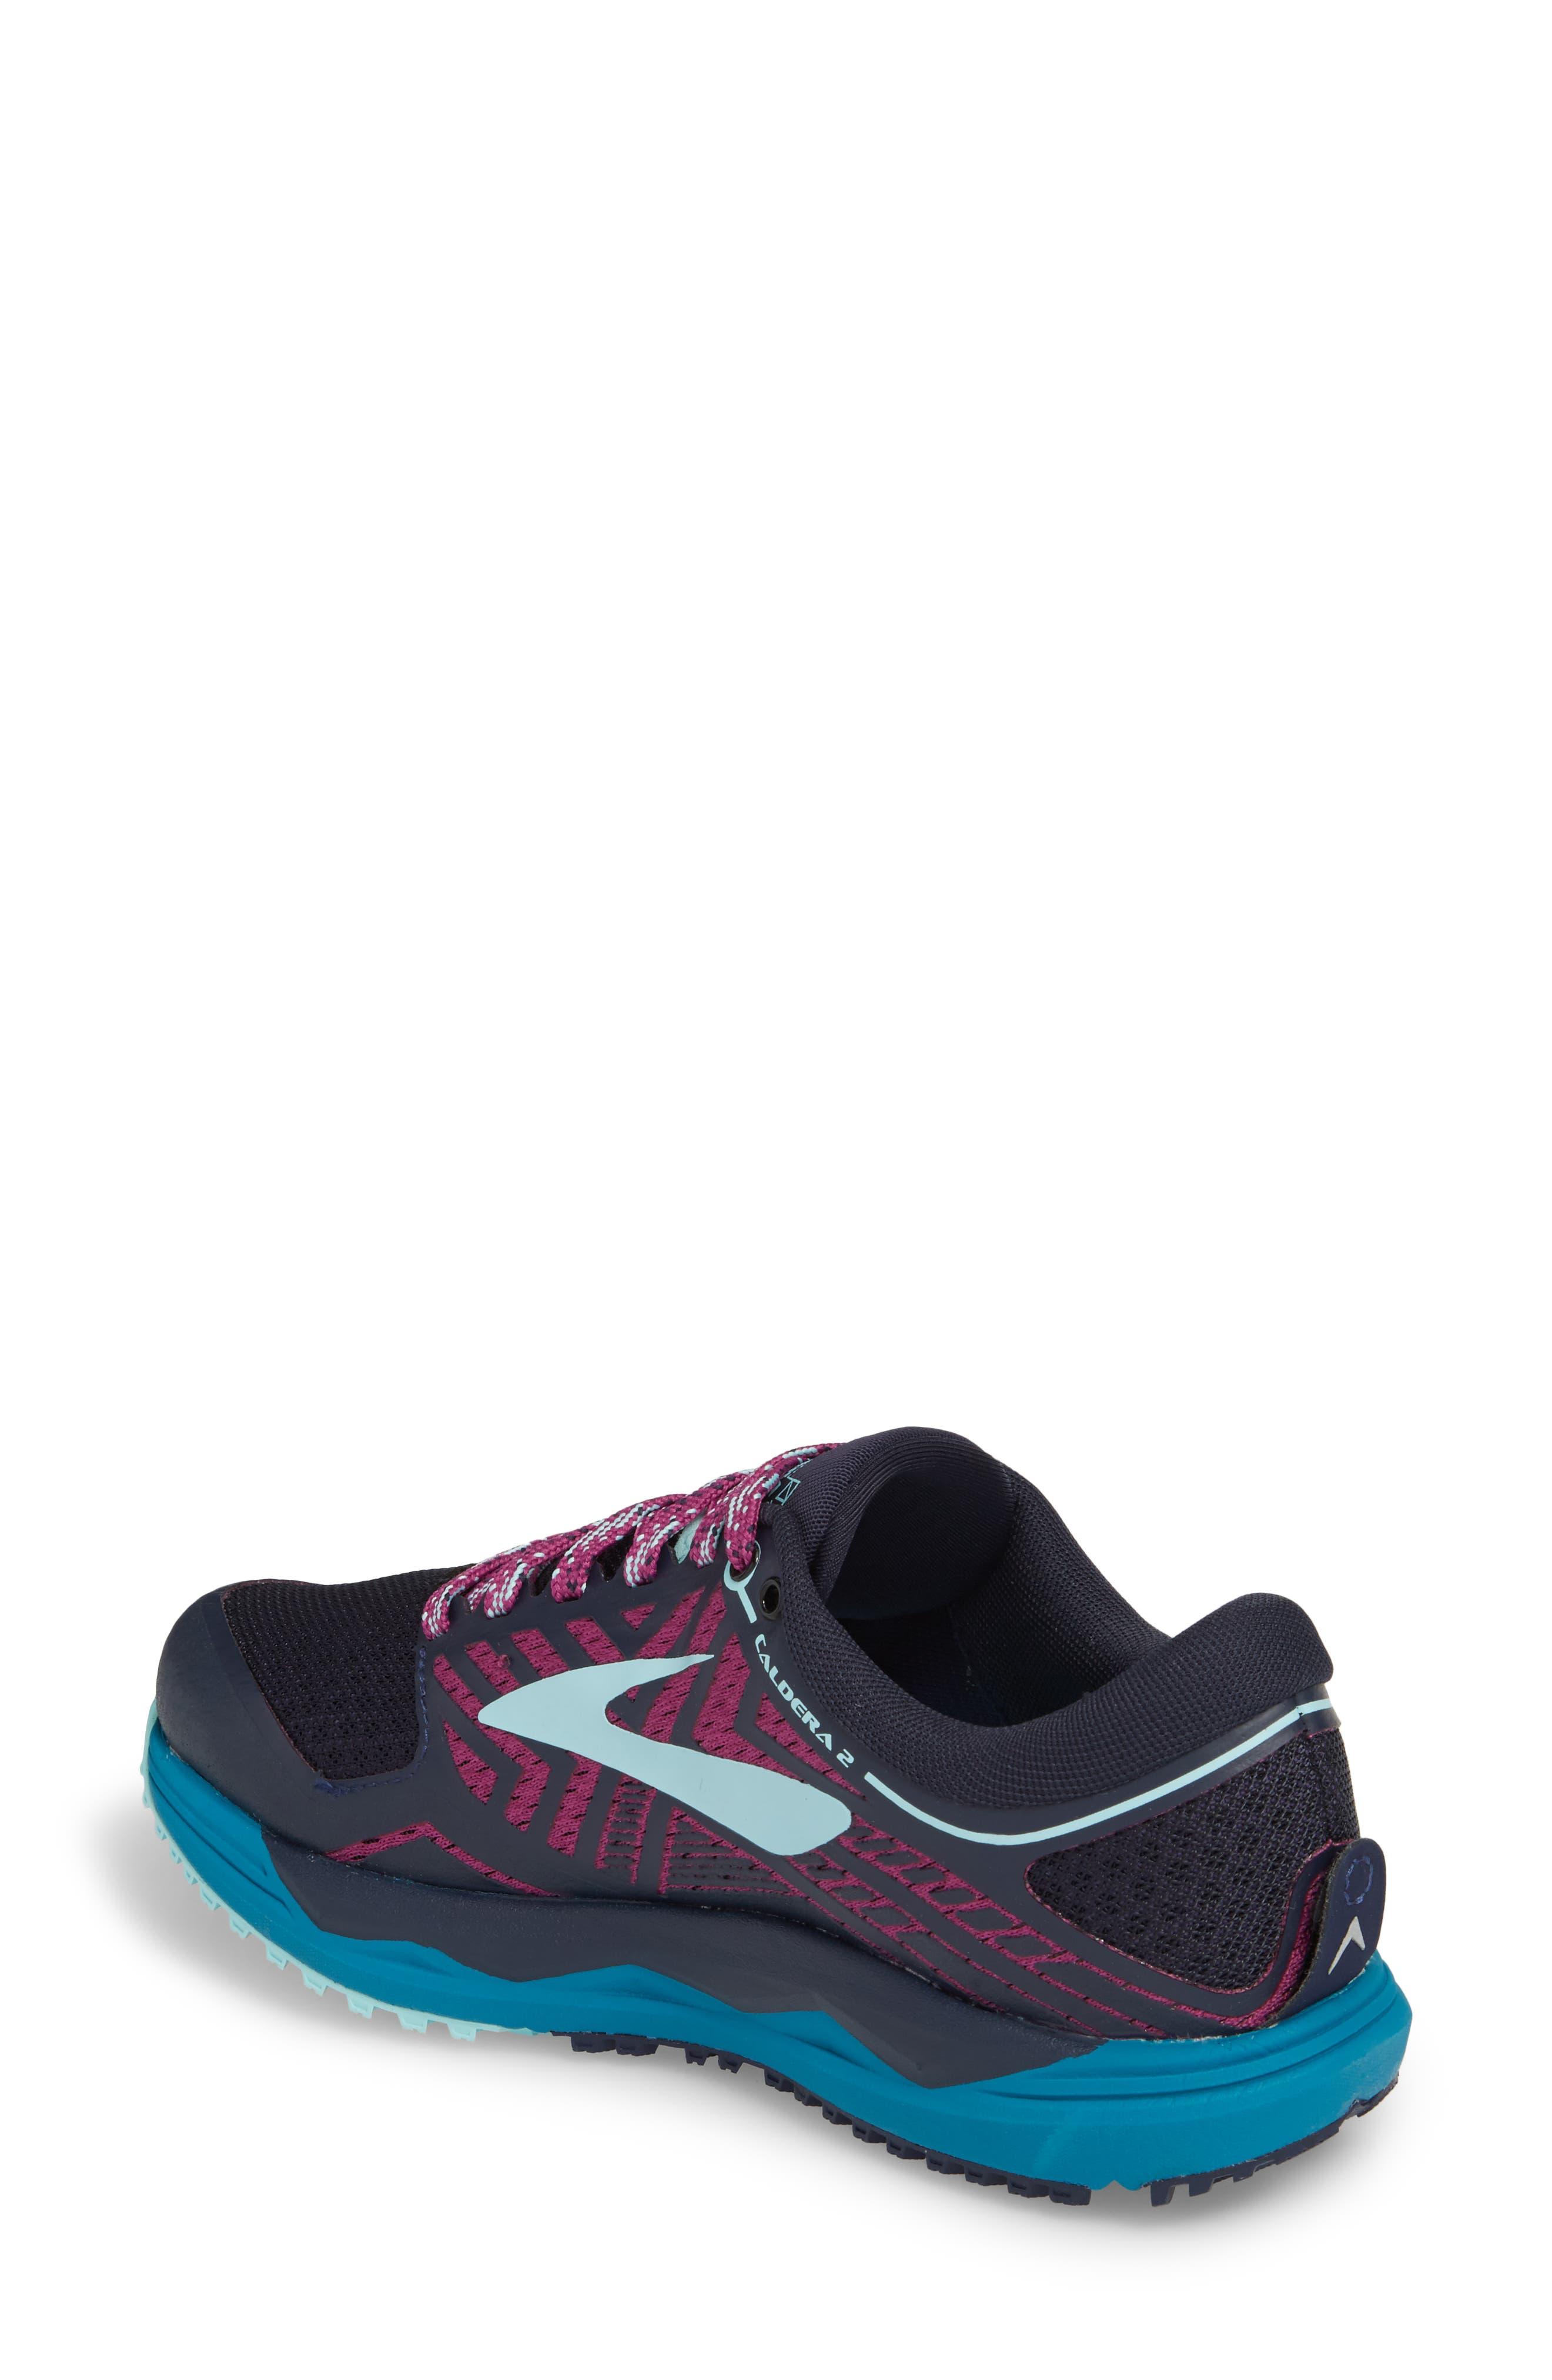 ,                             Caldera 2 Trail Running Shoe,                             Alternate thumbnail 2, color,                             NAVY/ PLUM/ ICE BLUE